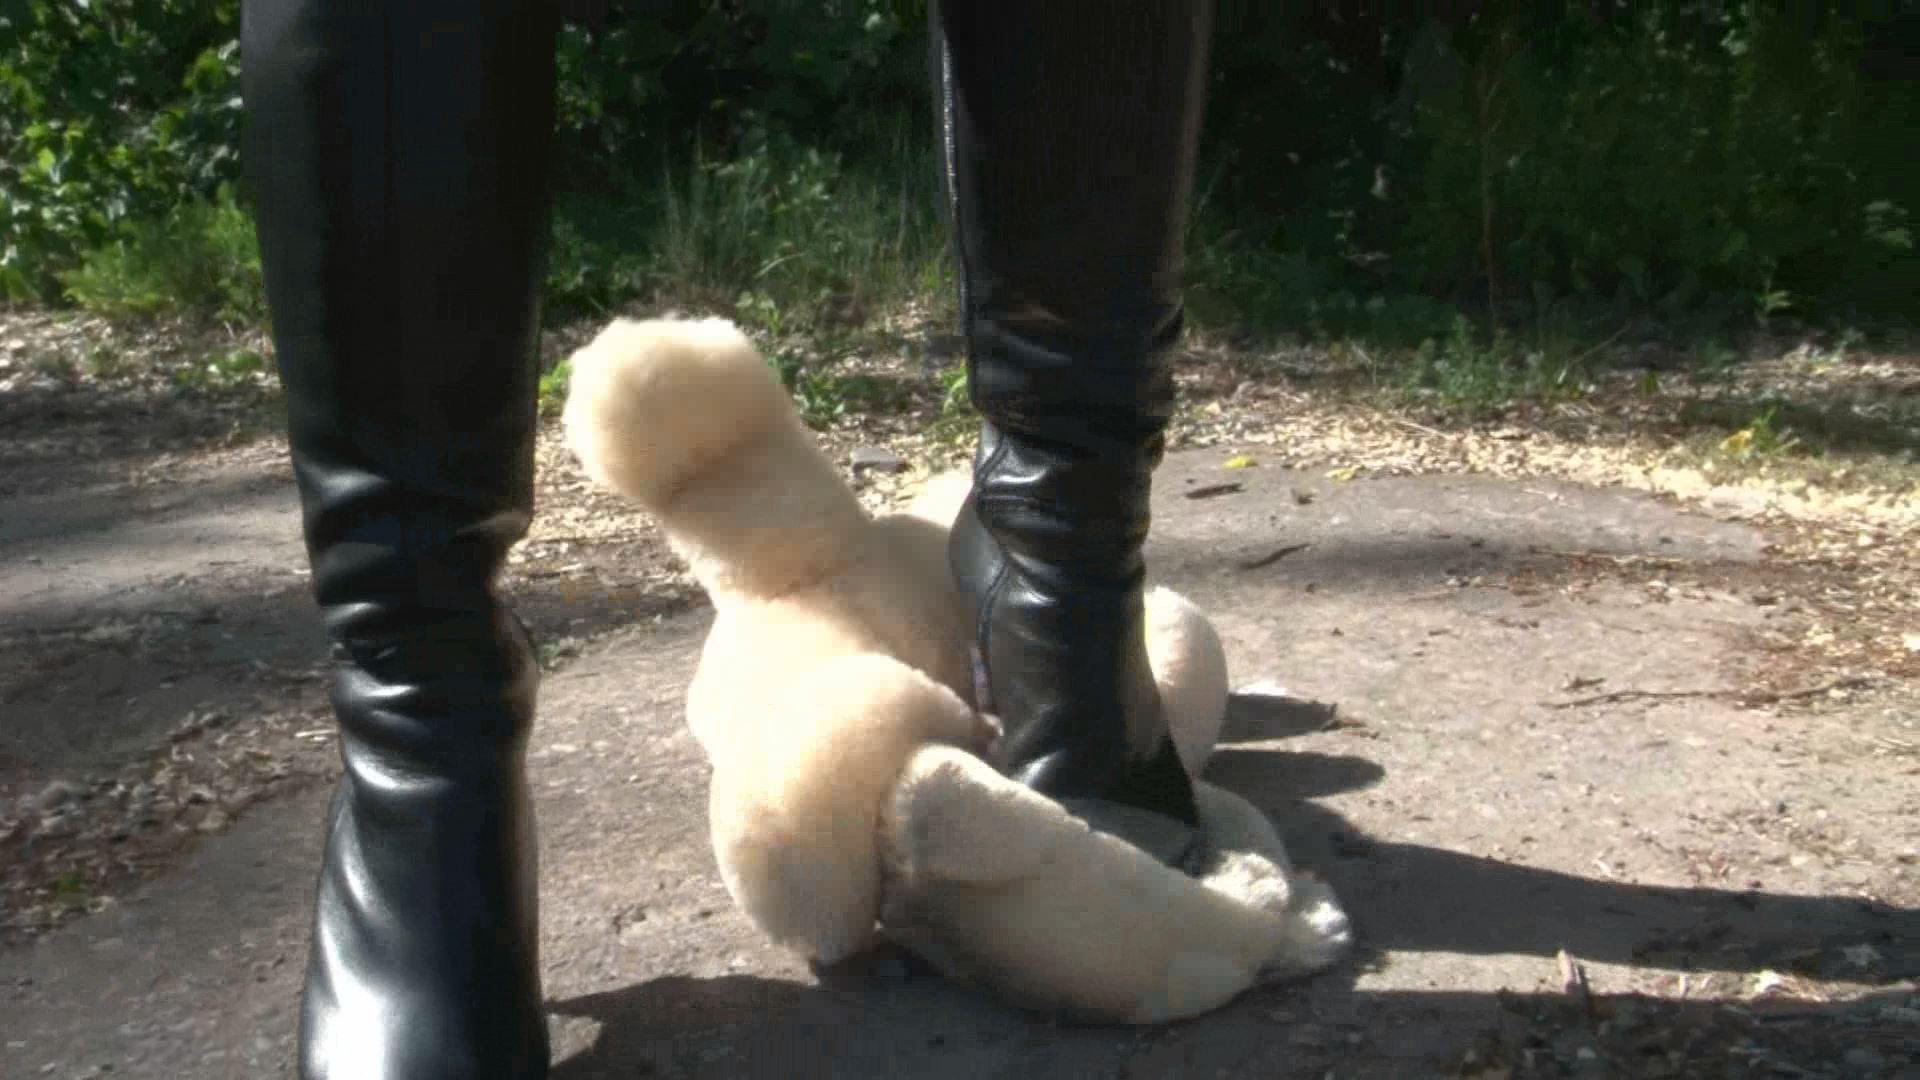 Mistress Chanel In Scene: Teddy Nose Crush - CLIPS4SALE / CRUSH PASSION - FULL HD/1080p/MP4